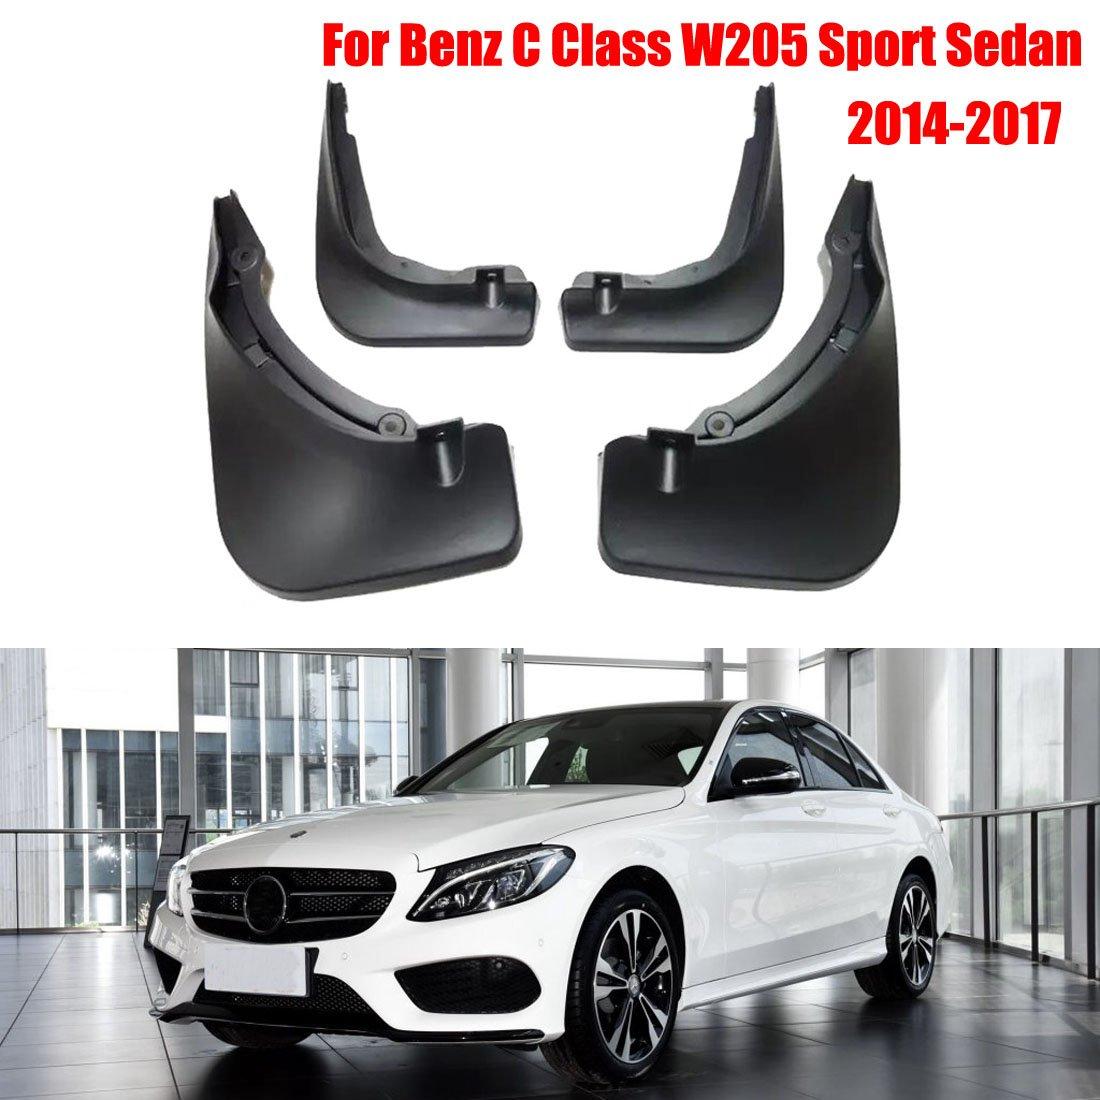 /2018 GDsun Auto parafanghi parafanghi paraspruzzi parafanghi paraspruzzi parafango protettiva per Benz classe C W205/sport berlina 2014/